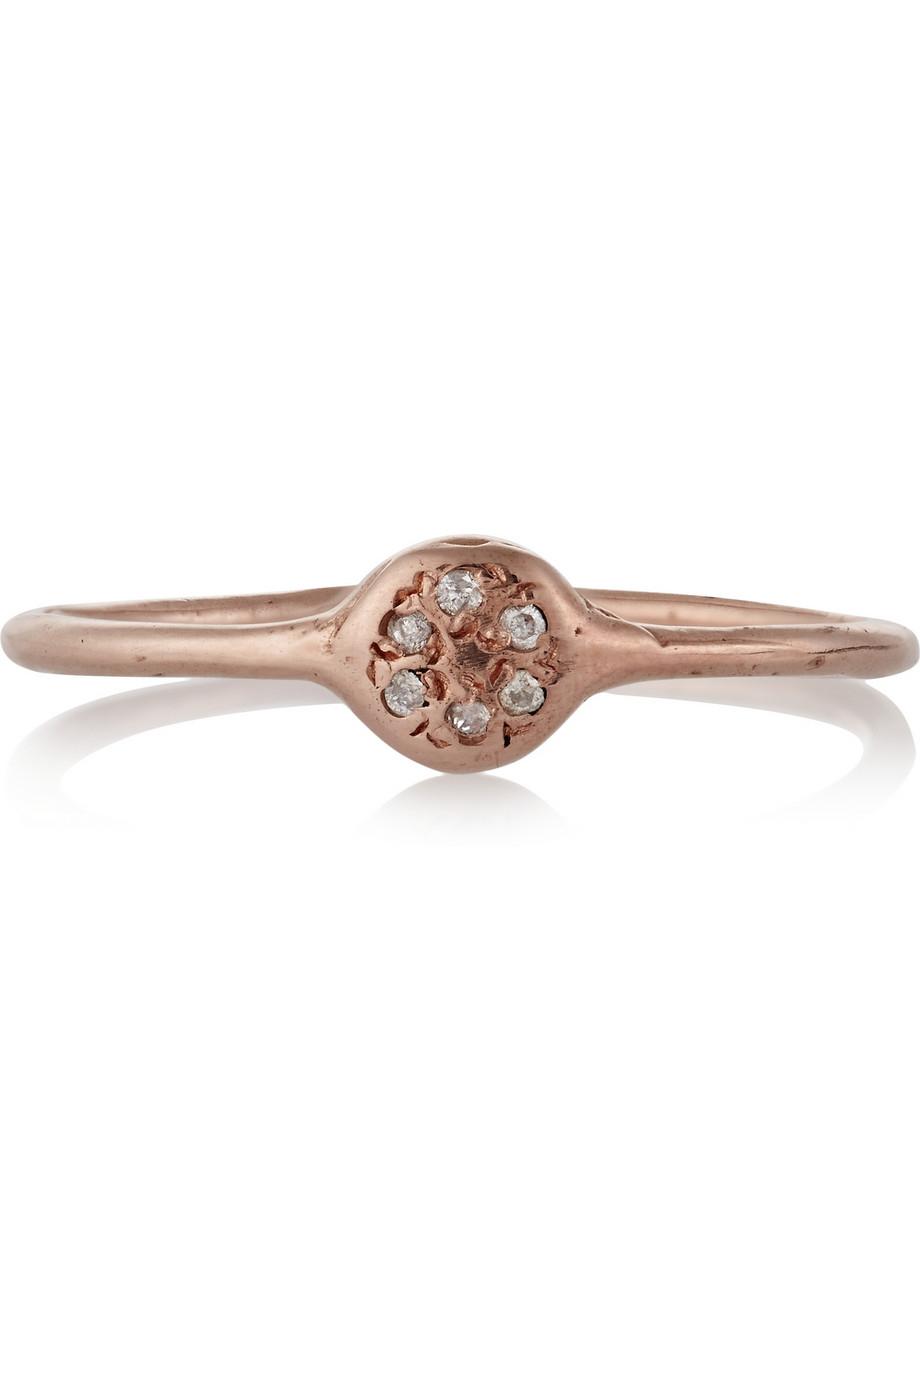 Lyst Scosha Lolli 10Karat Rose Gold Diamond Ring in Metallic